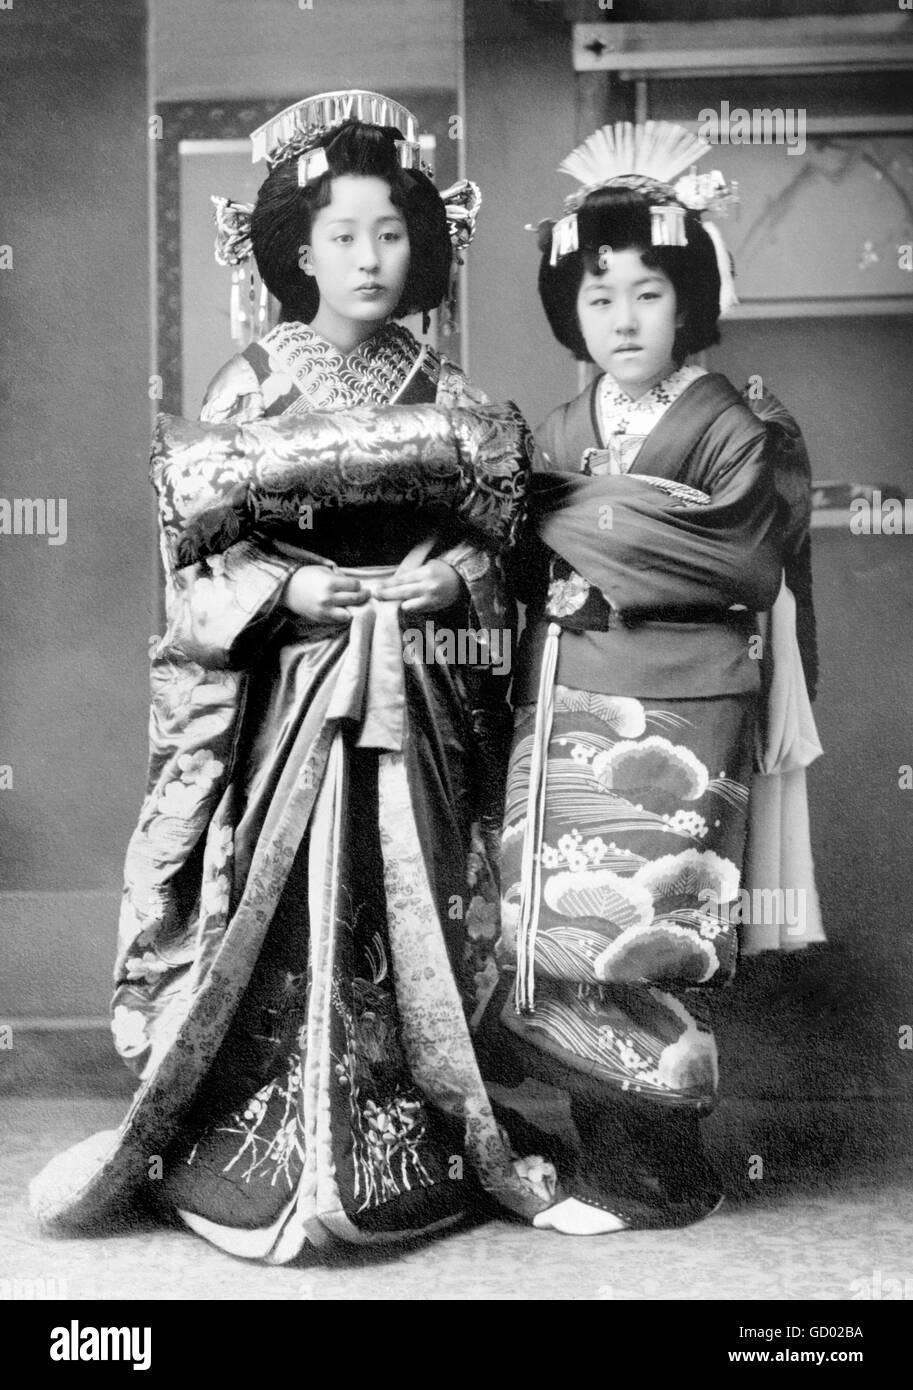 Japanese geishas tradition